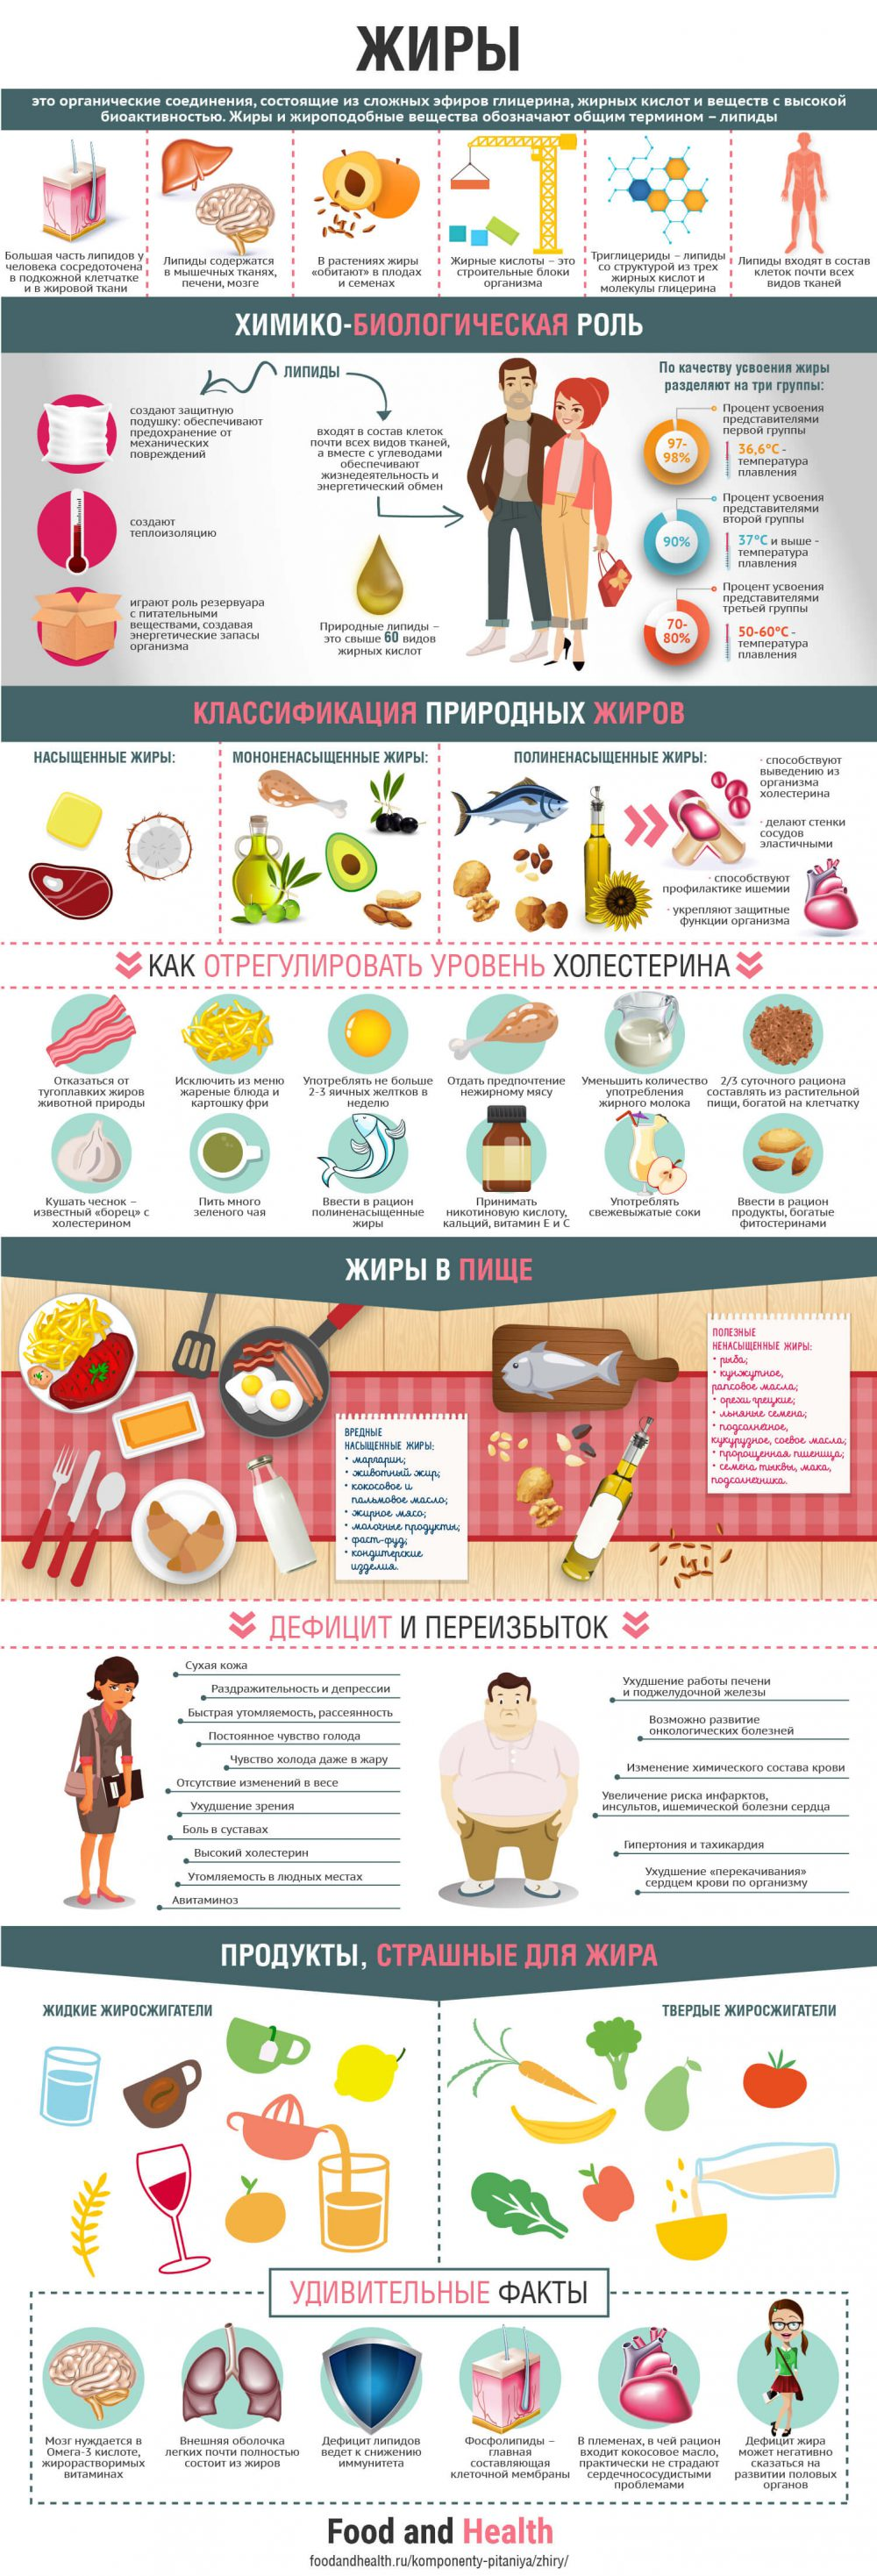 Жиры - инфографика